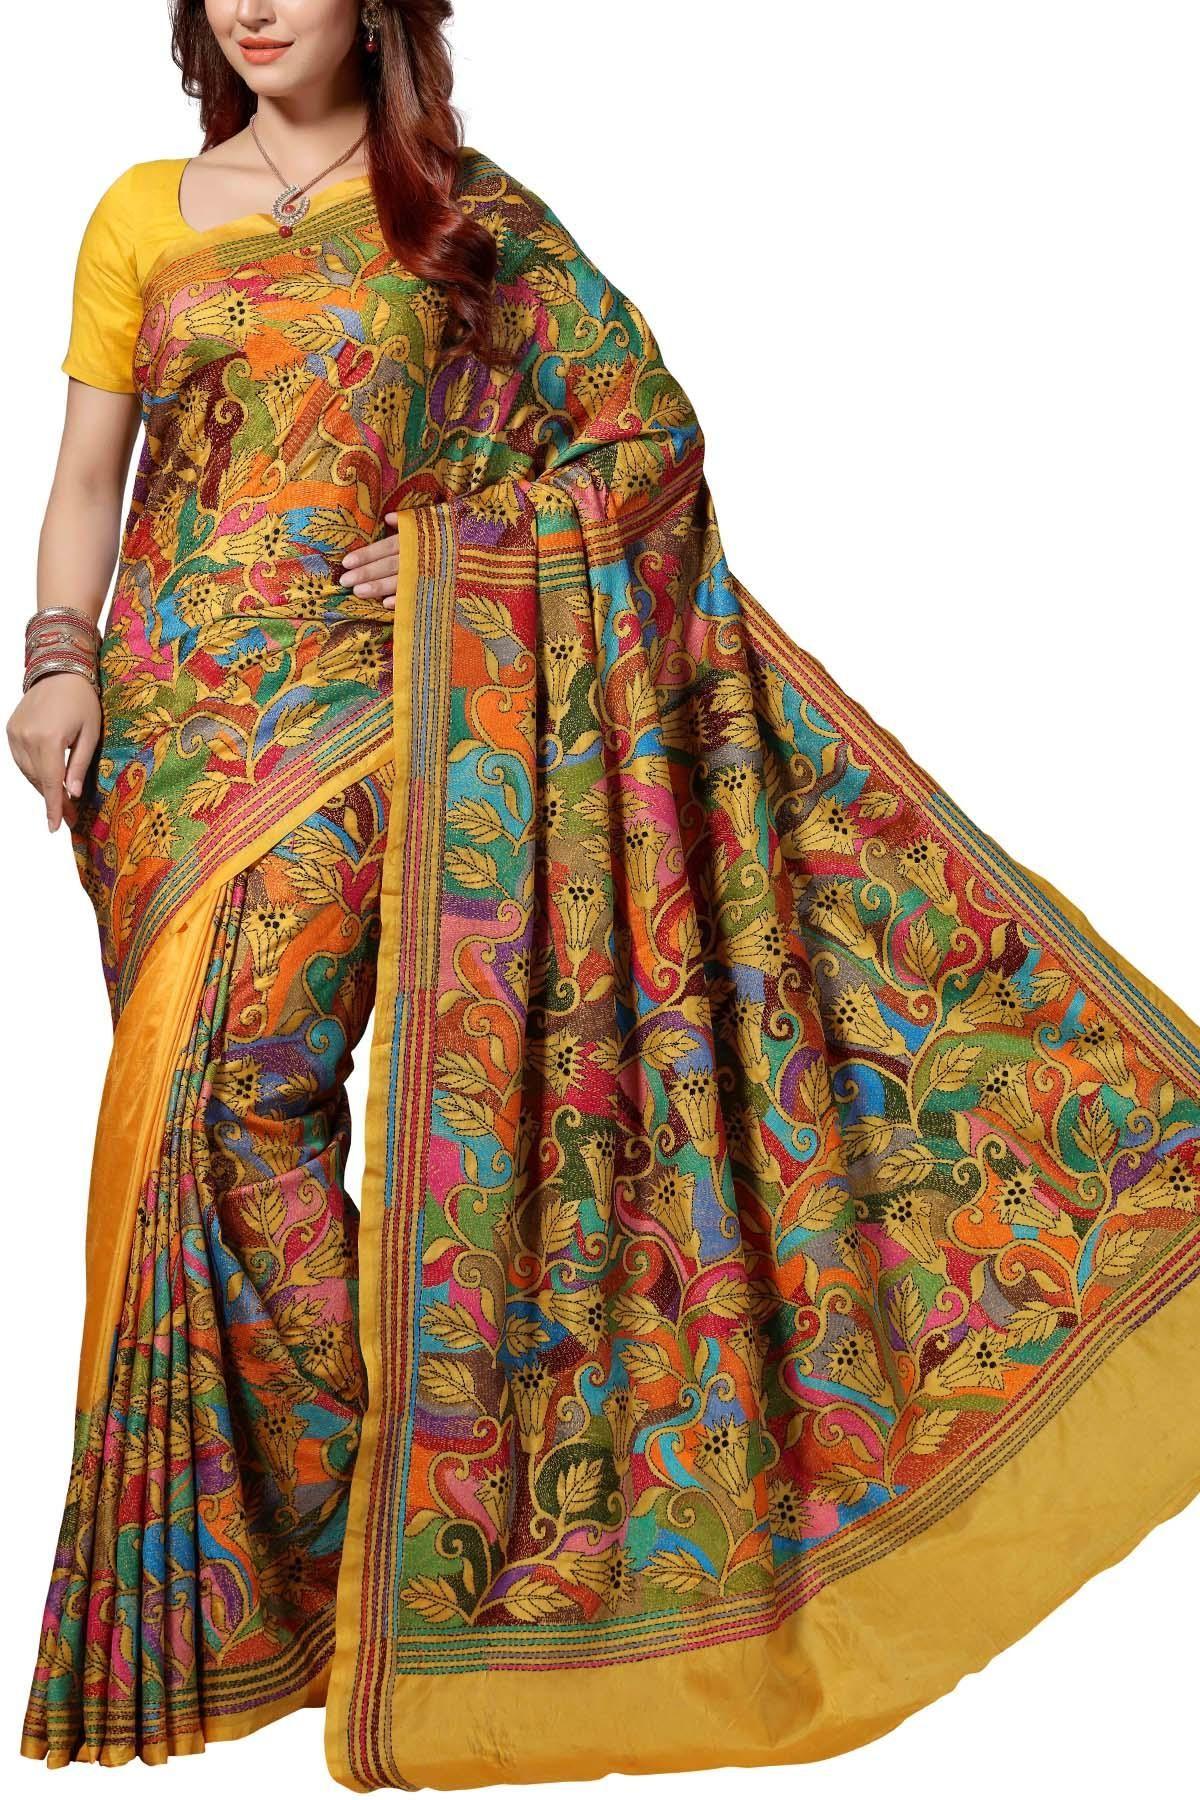 ecfca3a54a Amber Gold & Multi-colored Floral Nakshi Kantha Soft Silk Saree ...